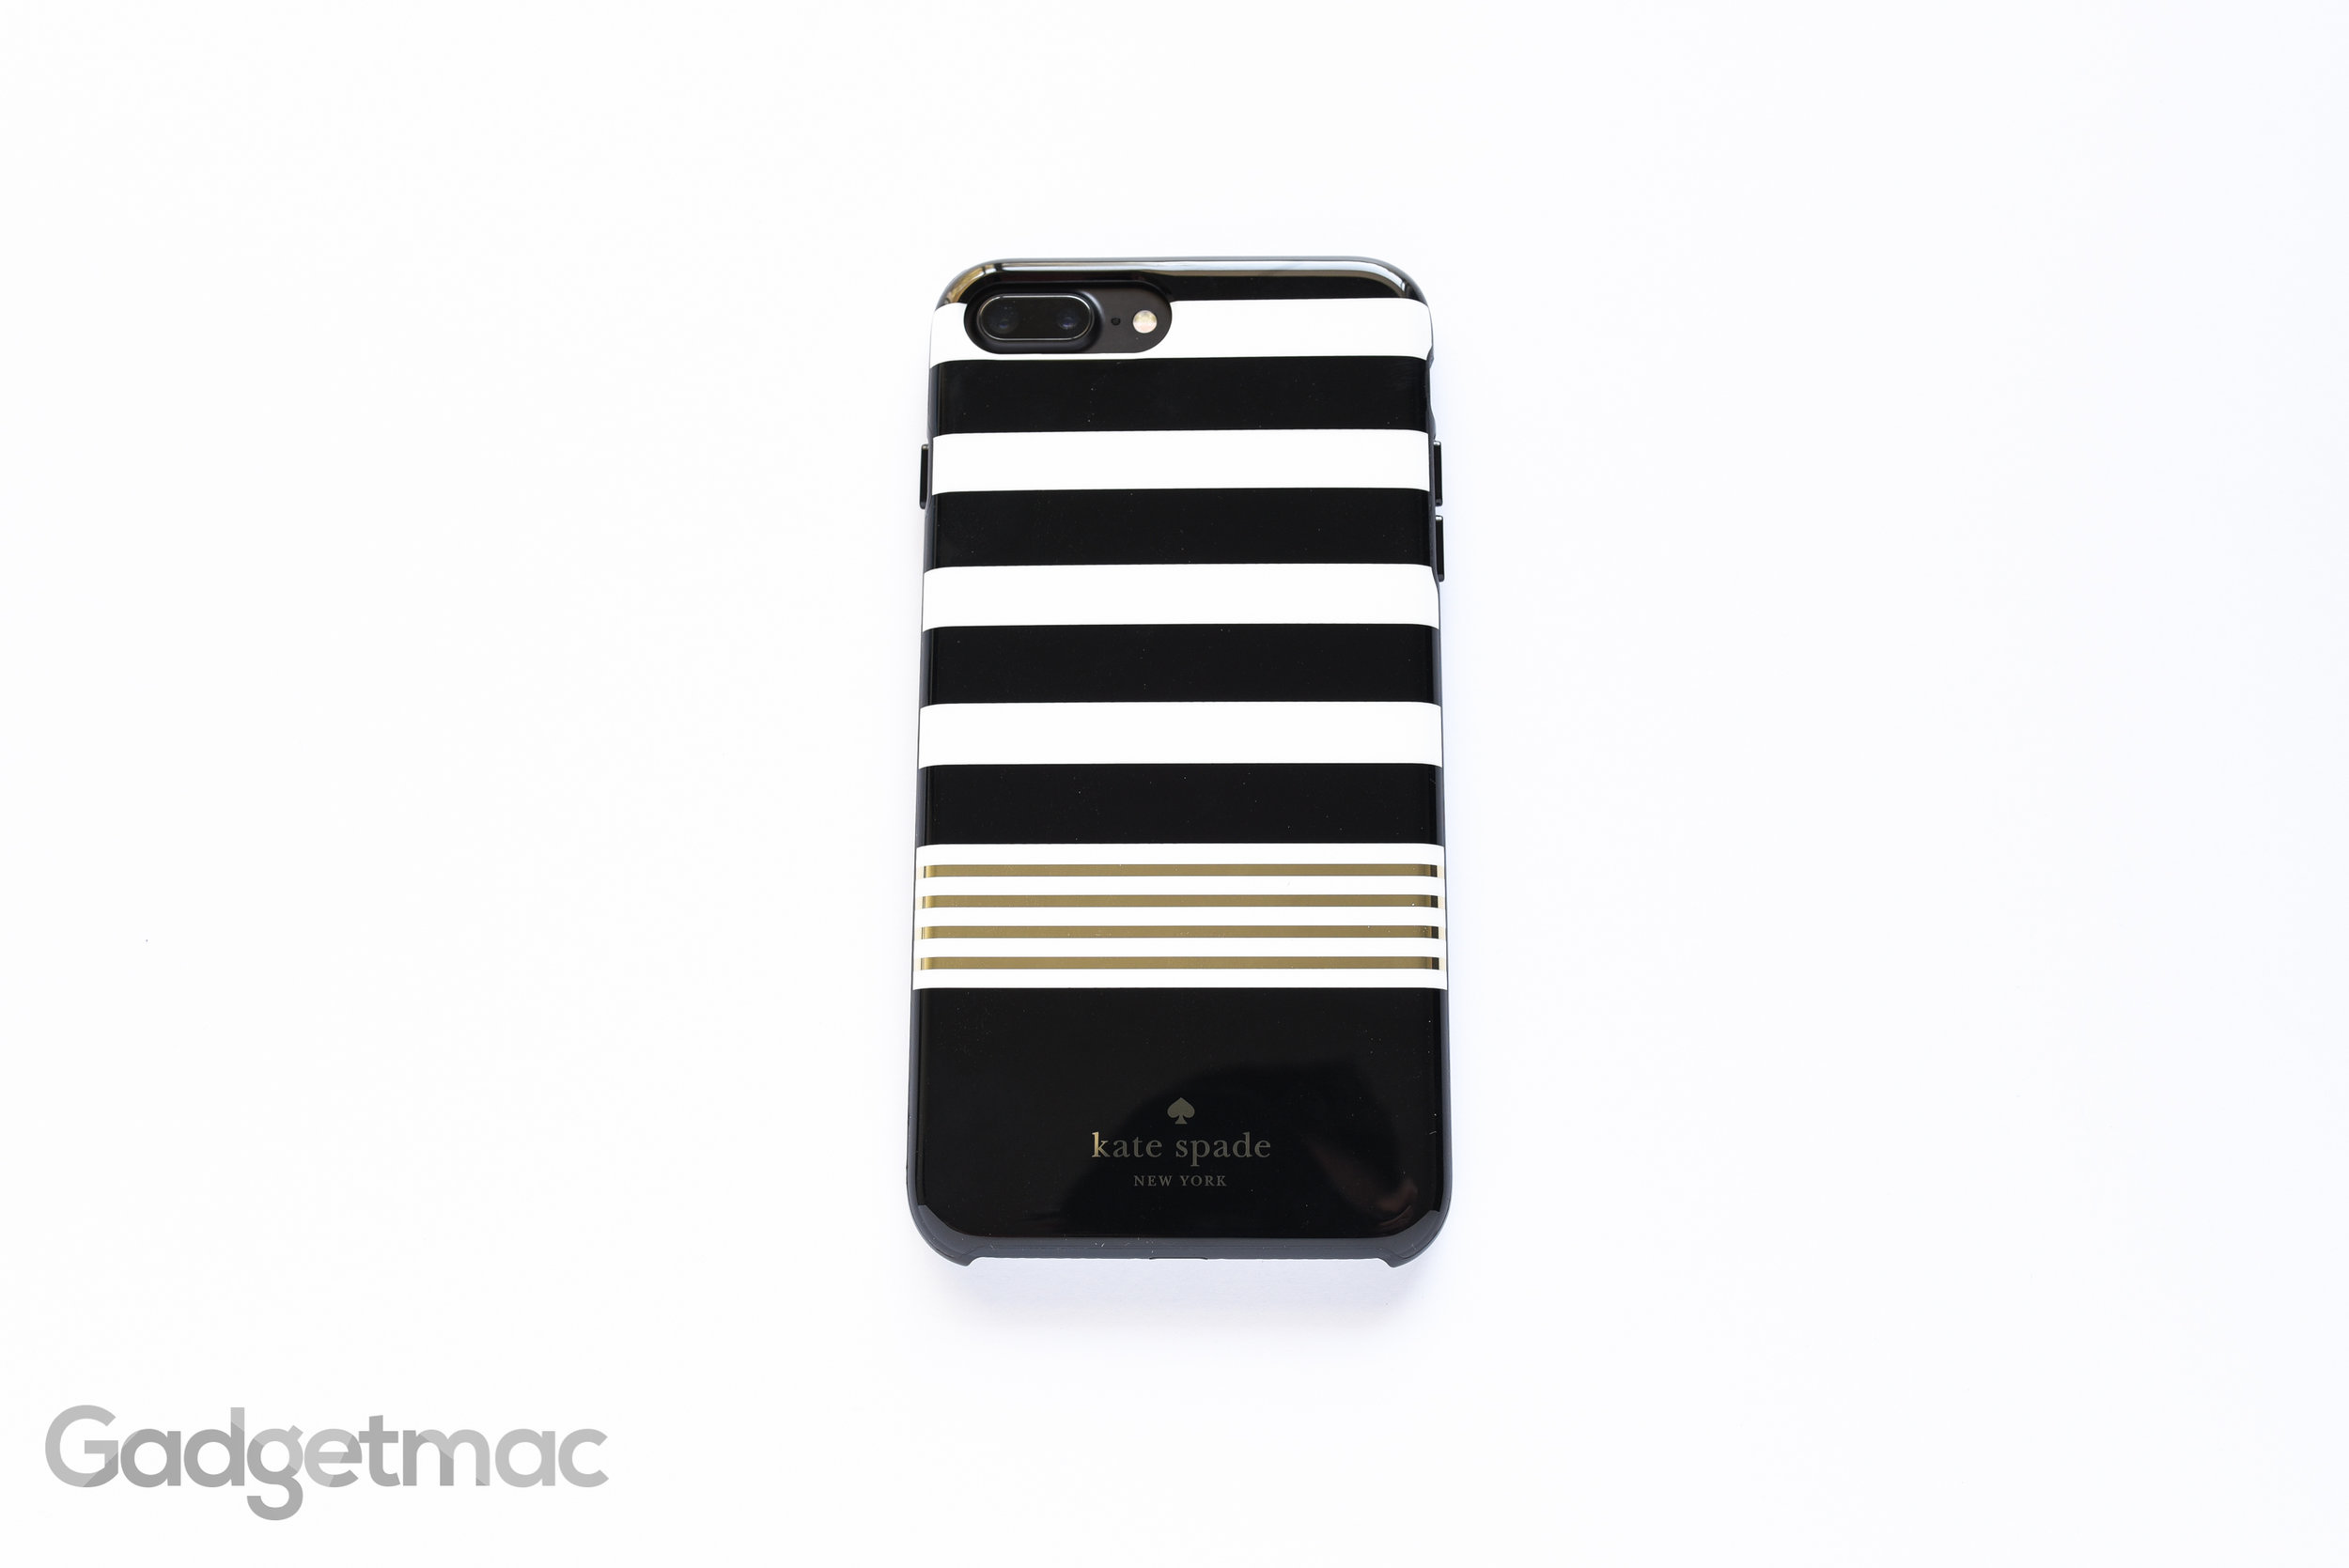 kate-spade-iphone-7-plus-case.jpg